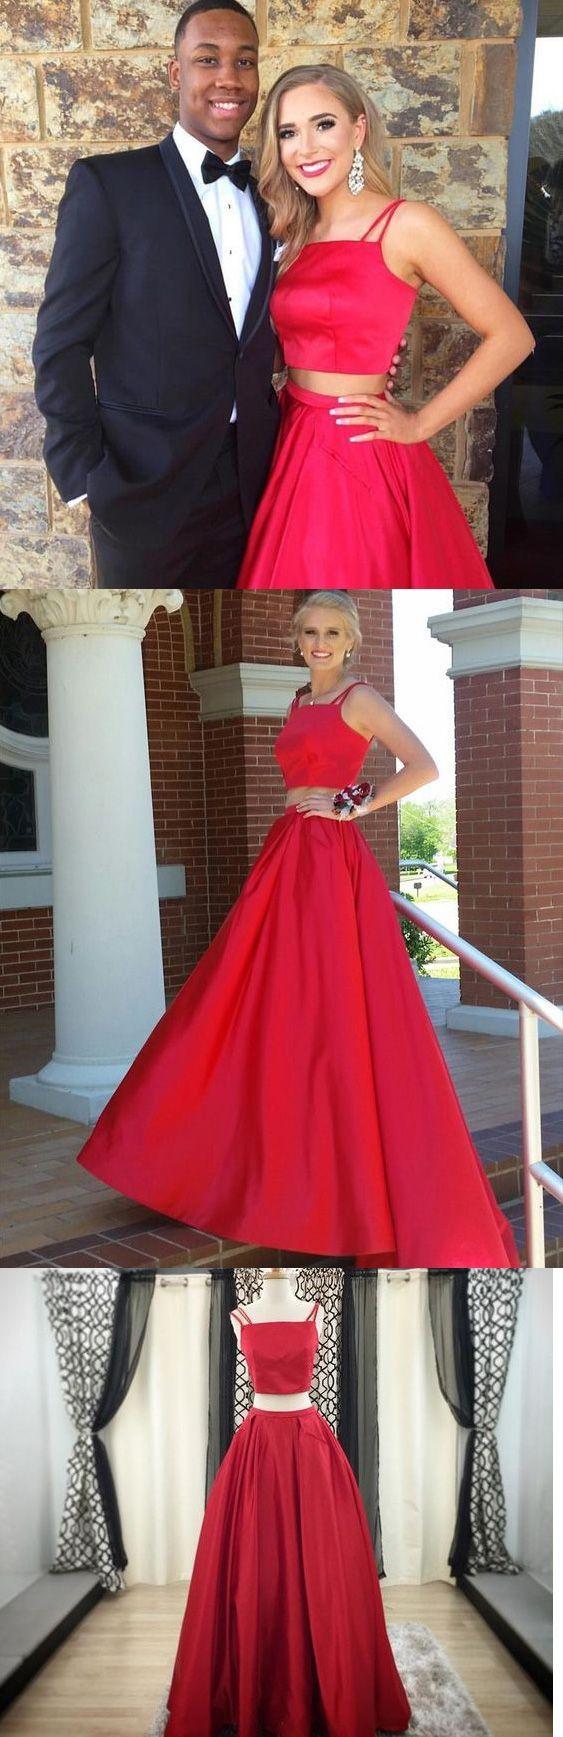 Red two piece prom dress sexy prom dresses fashionpromdress